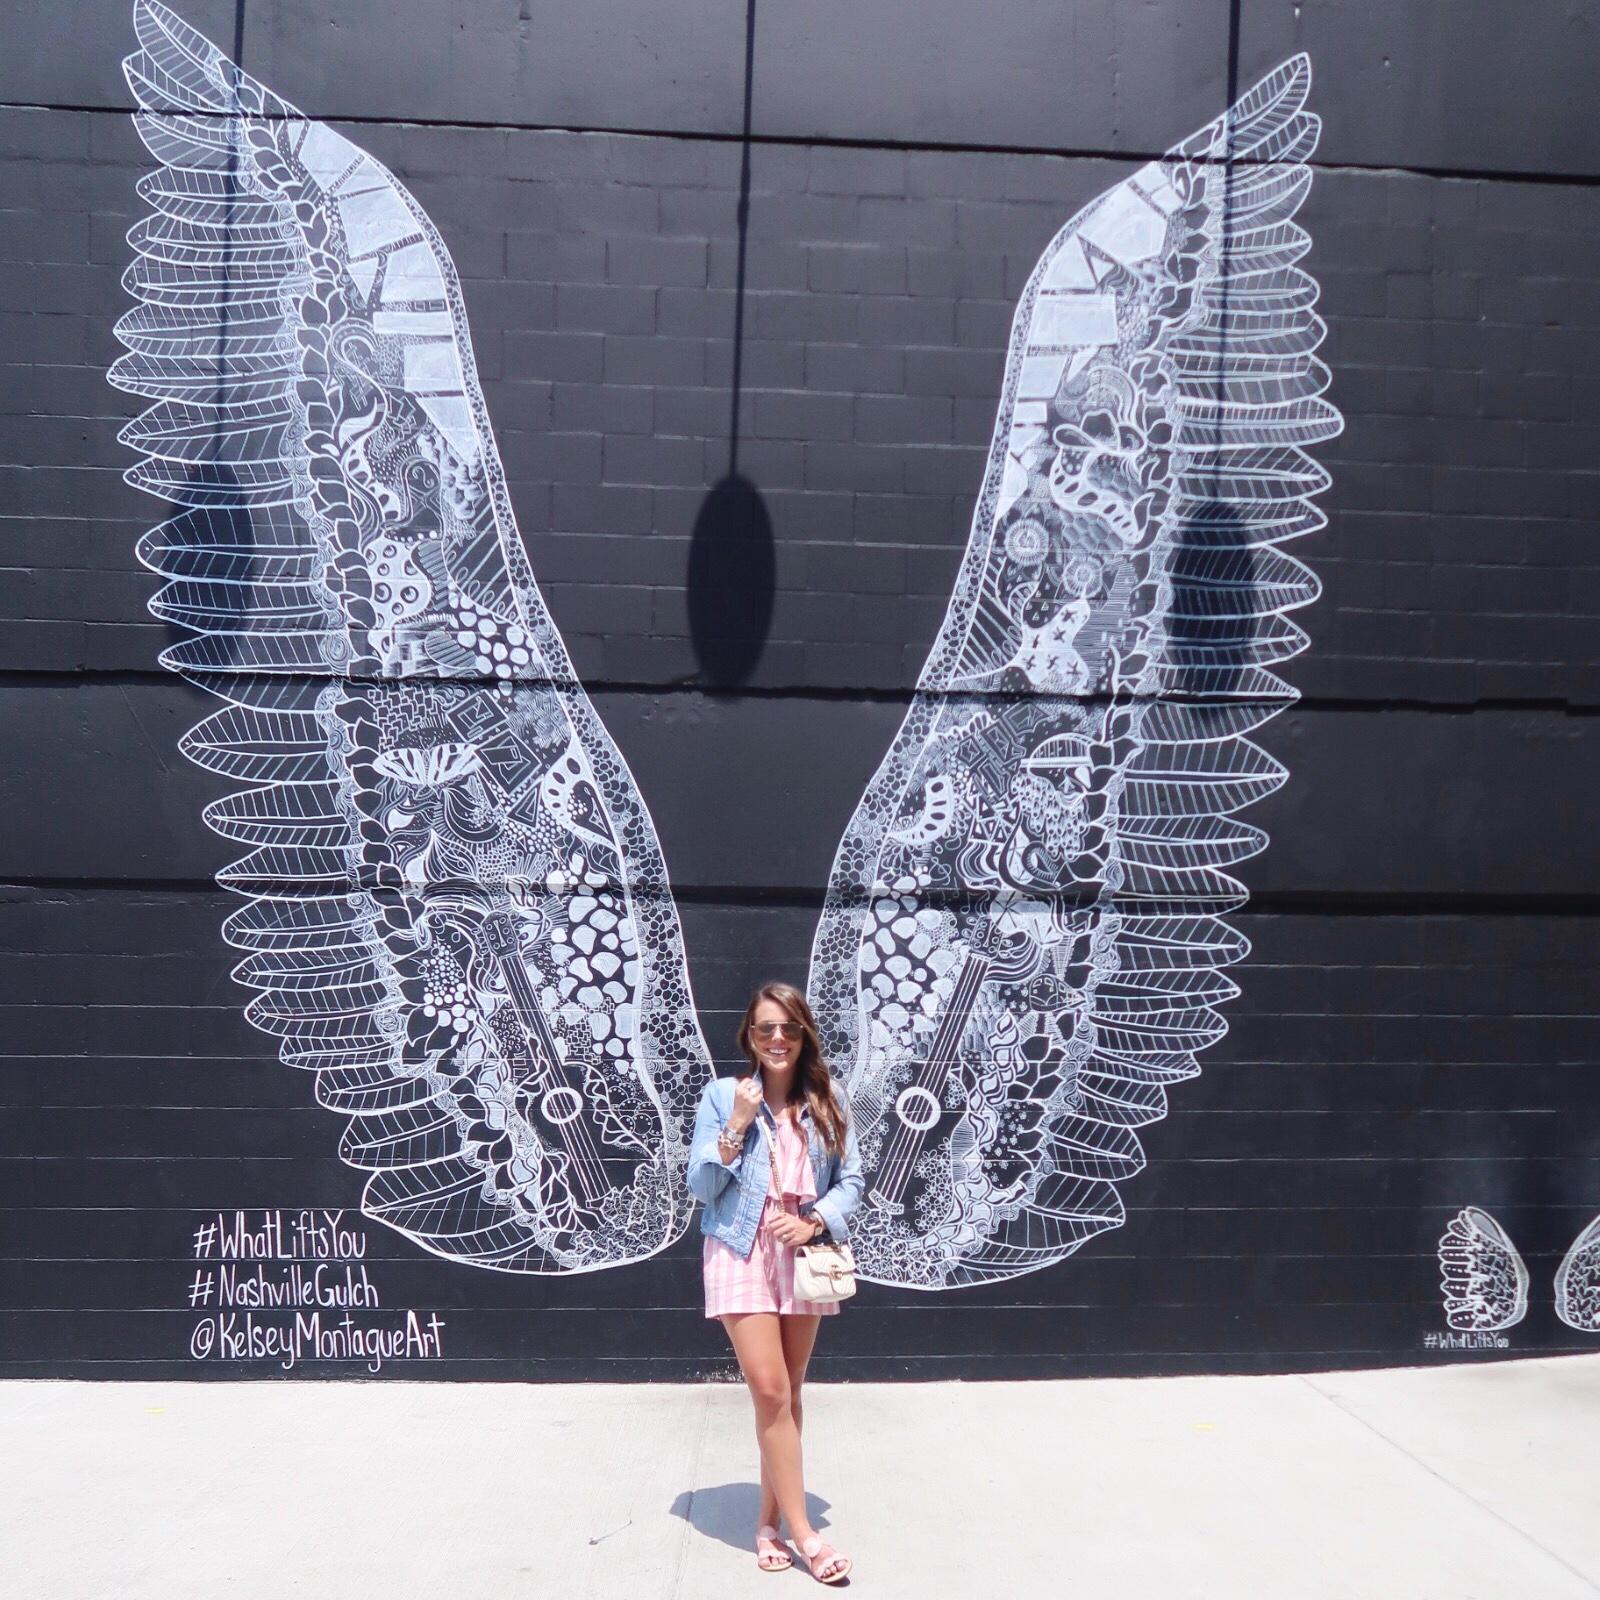 Nashville City Guide / Where to brunch in Nashville